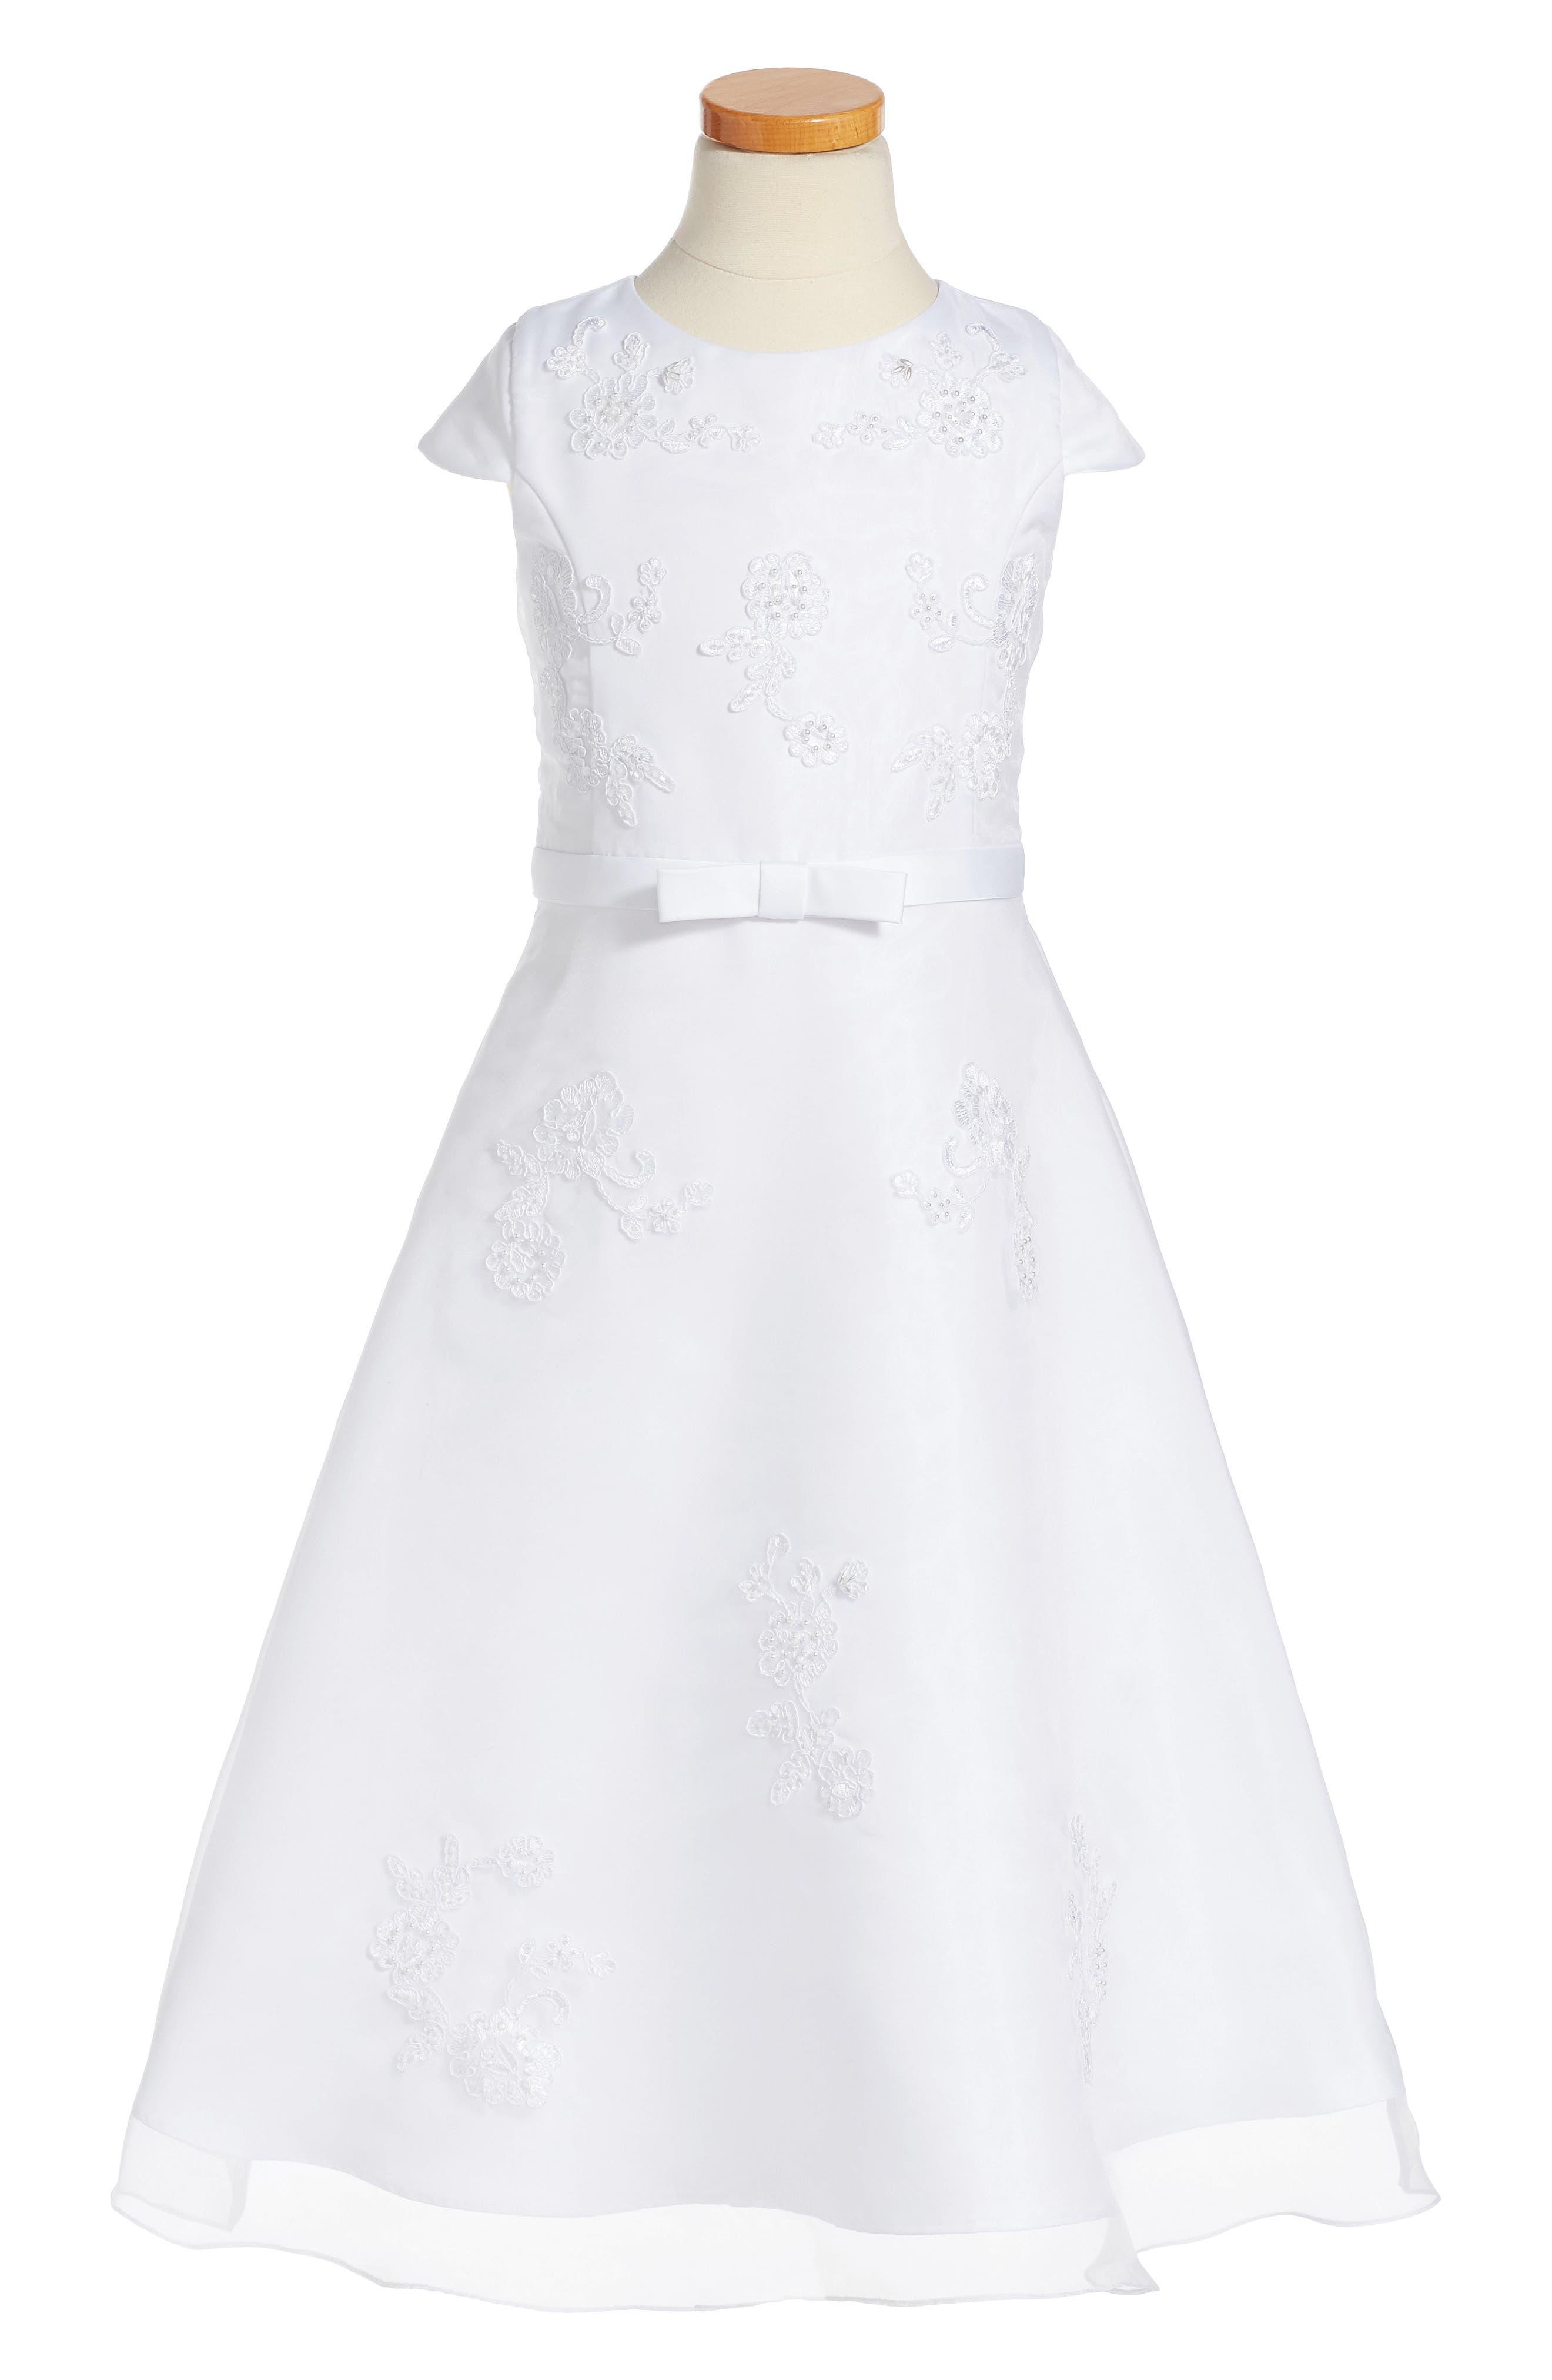 Lace Floral Fit & Flare Dress,                             Main thumbnail 1, color,                             WHITE